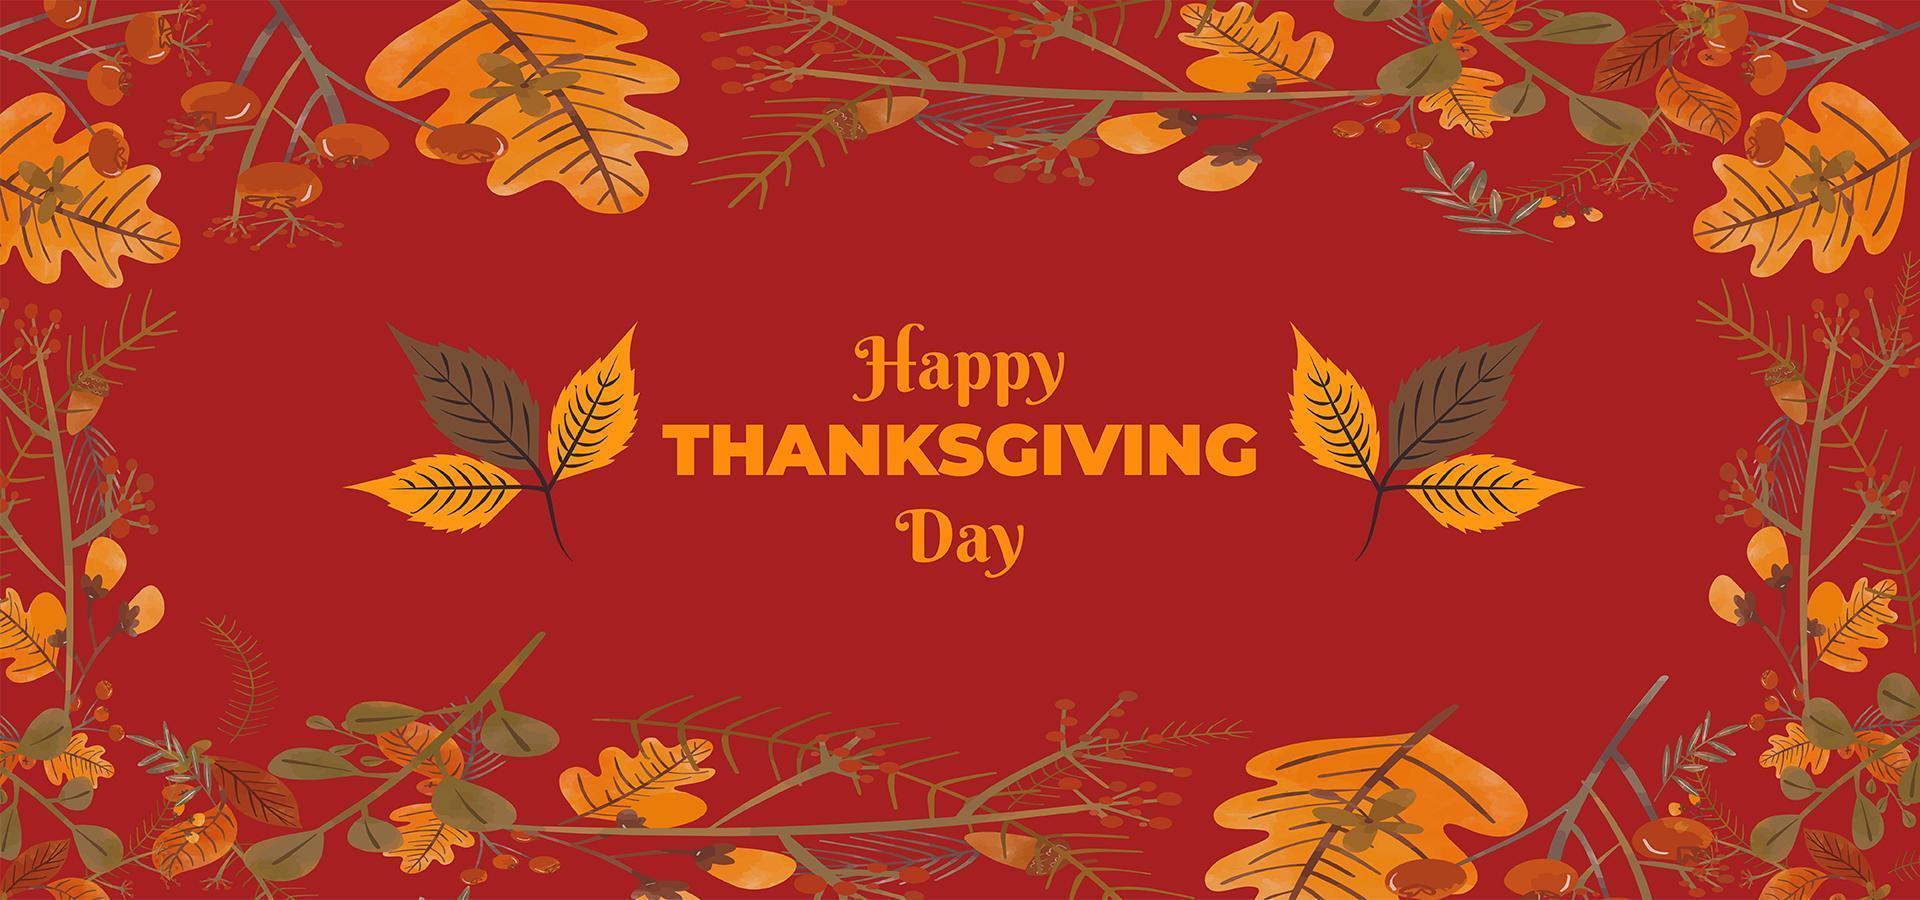 Thanksgiving Day Celebrations Wallpaper